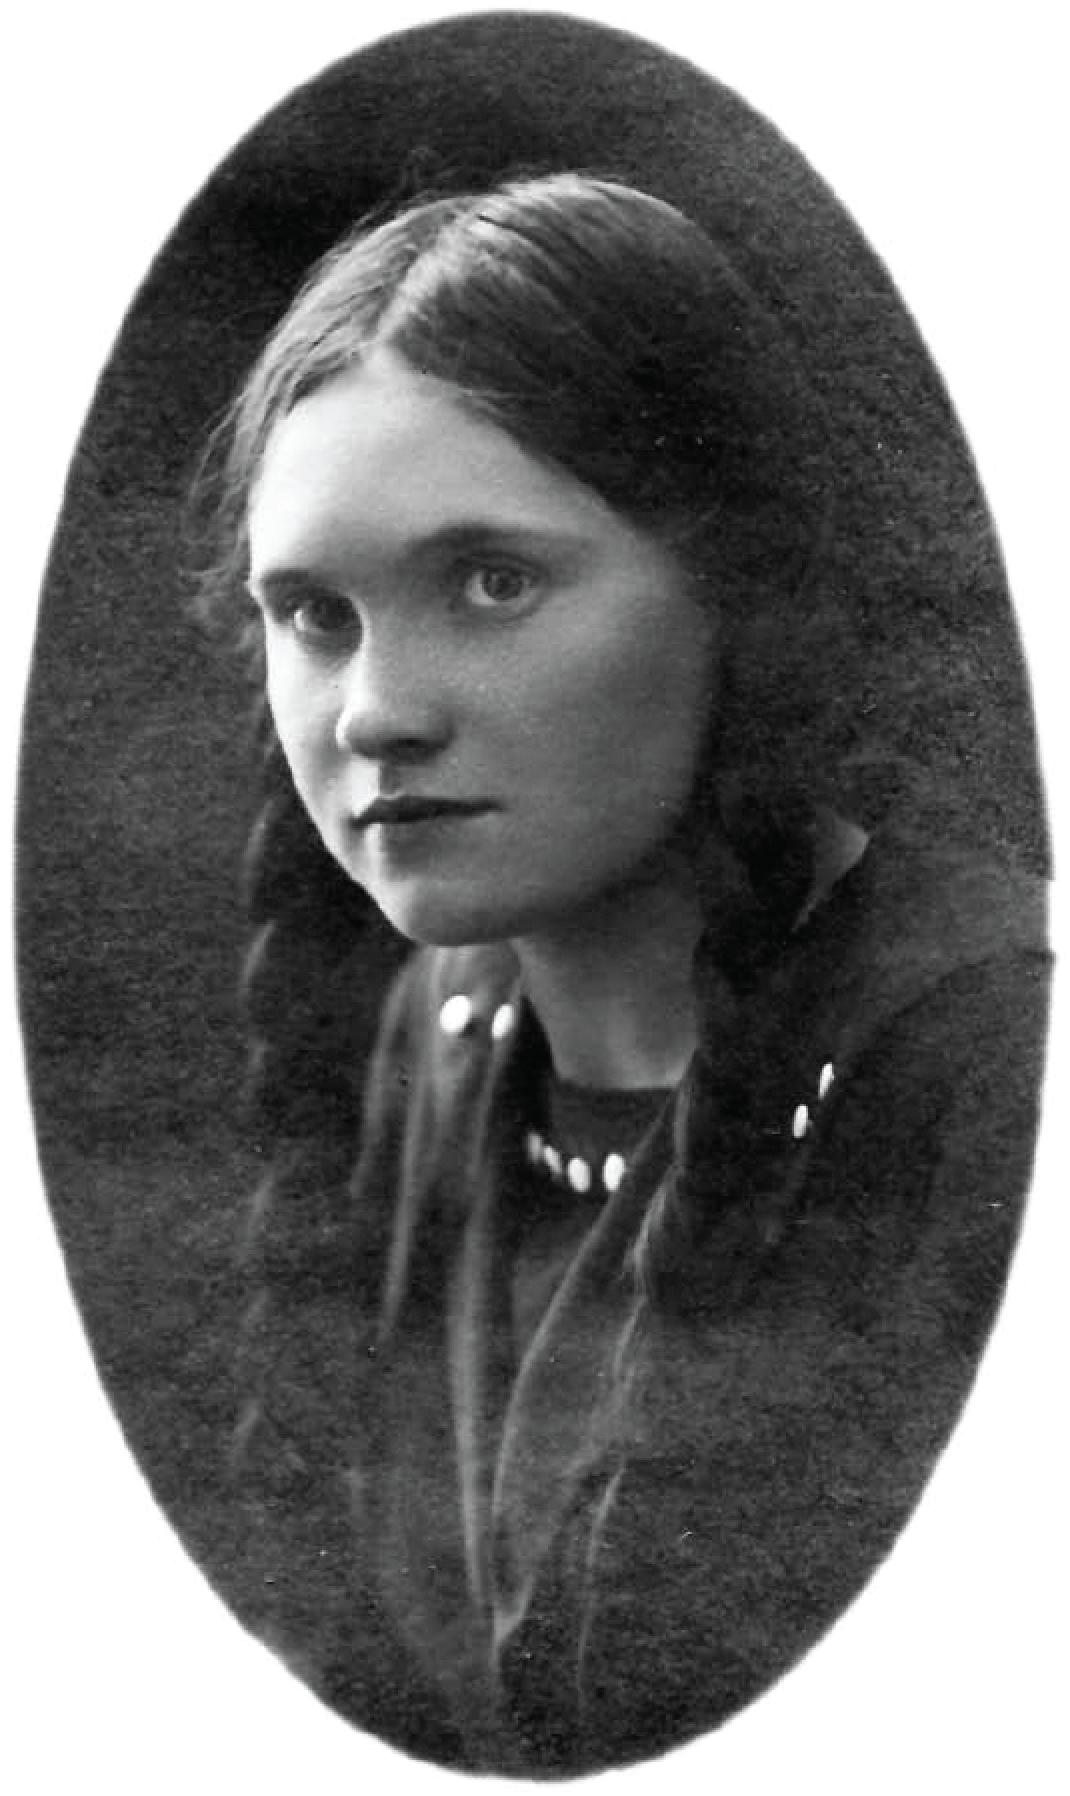 Ewa Grodecka